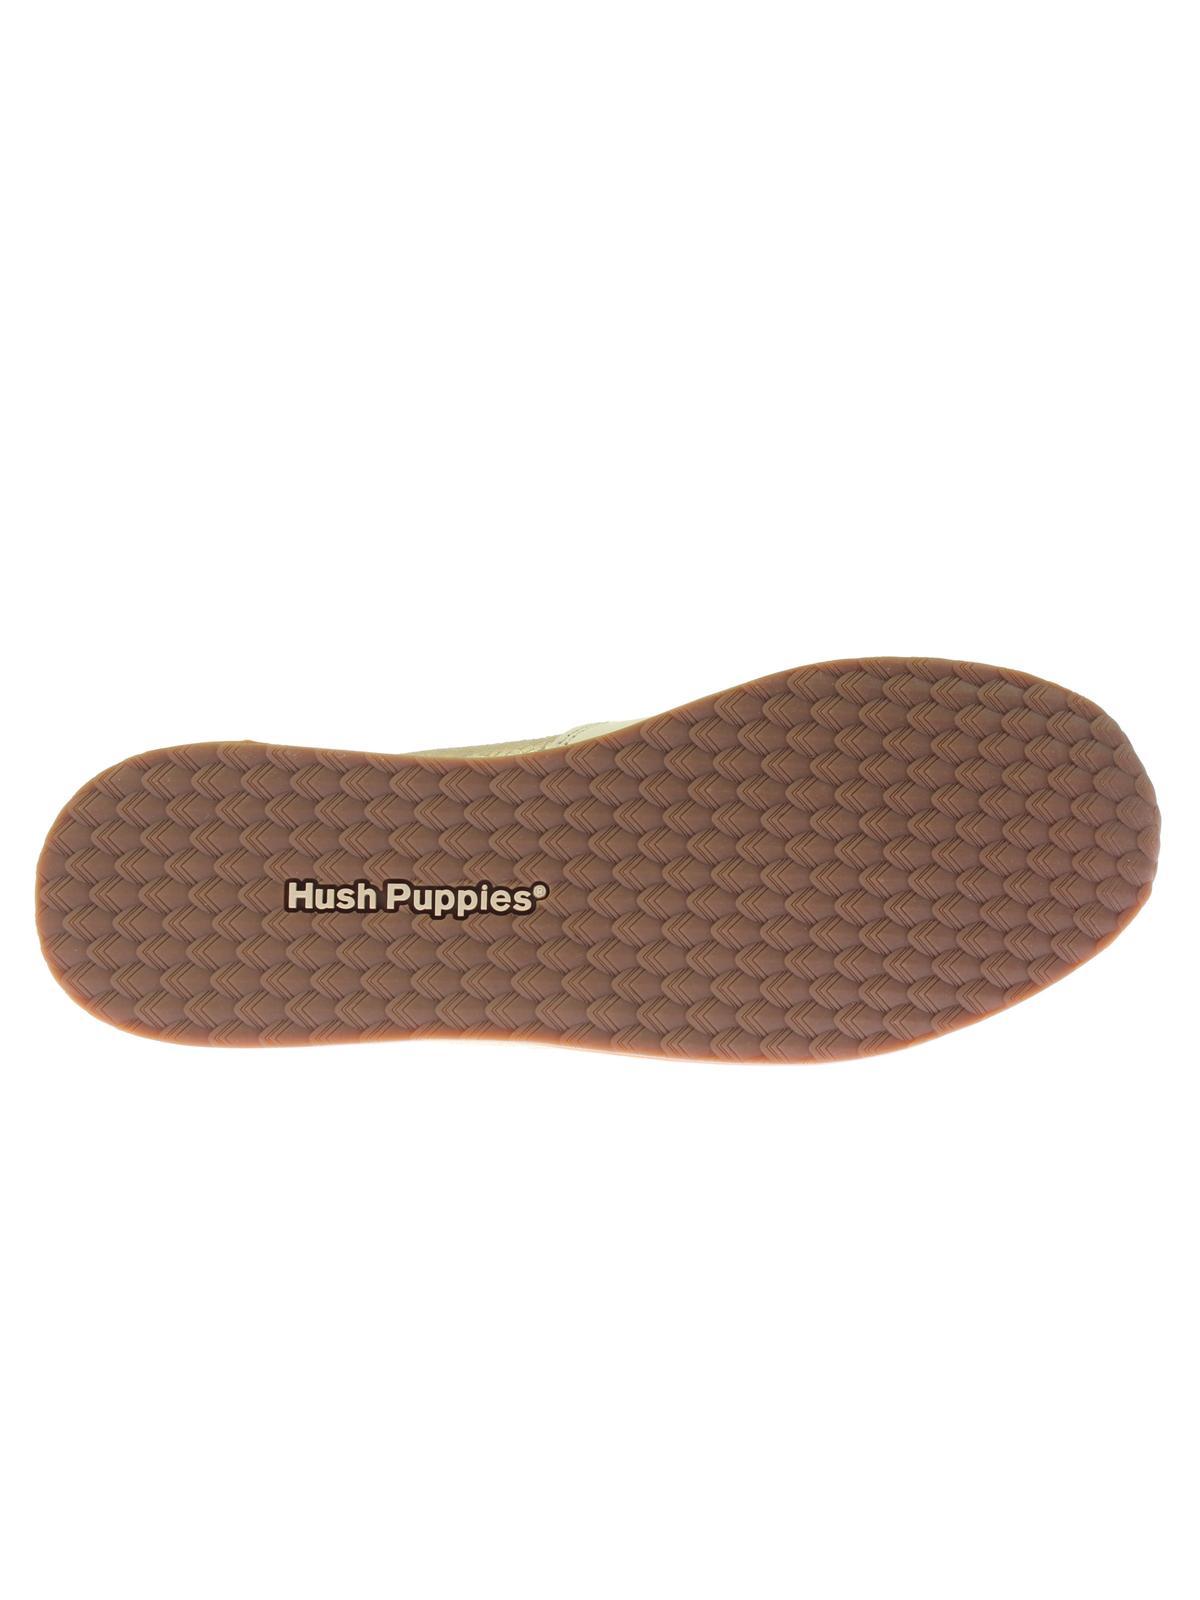 Hush Puppies Womens Chazy Dayo Suede Medium Fashion Sneakers Gold 5.5 Medium Suede (B,M) 60b82f